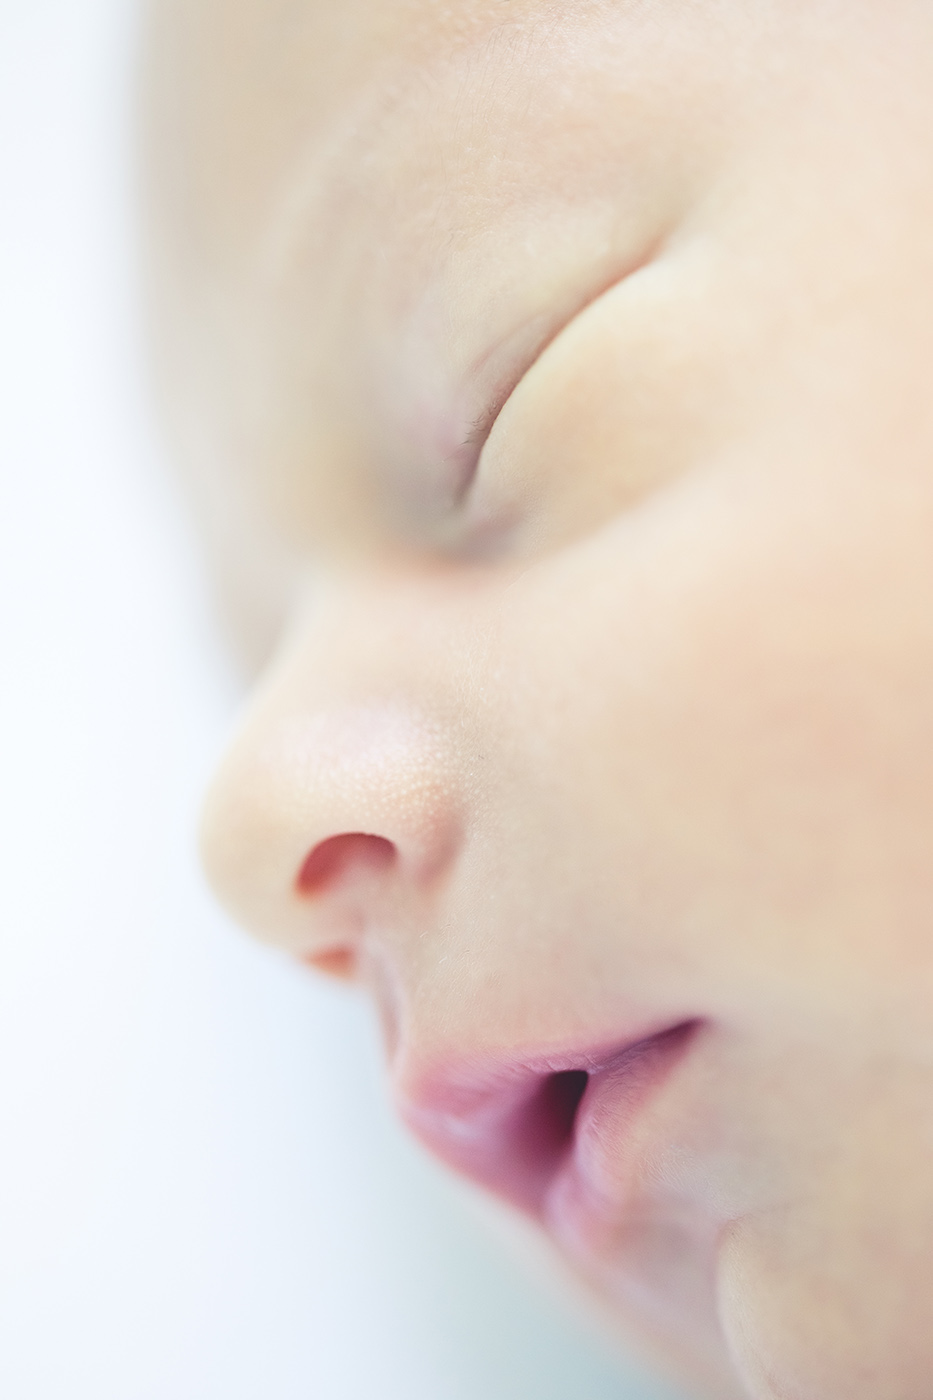 photographe-naissance-maternite-enfant-bebe-poitiers-guillaume-heraud-12